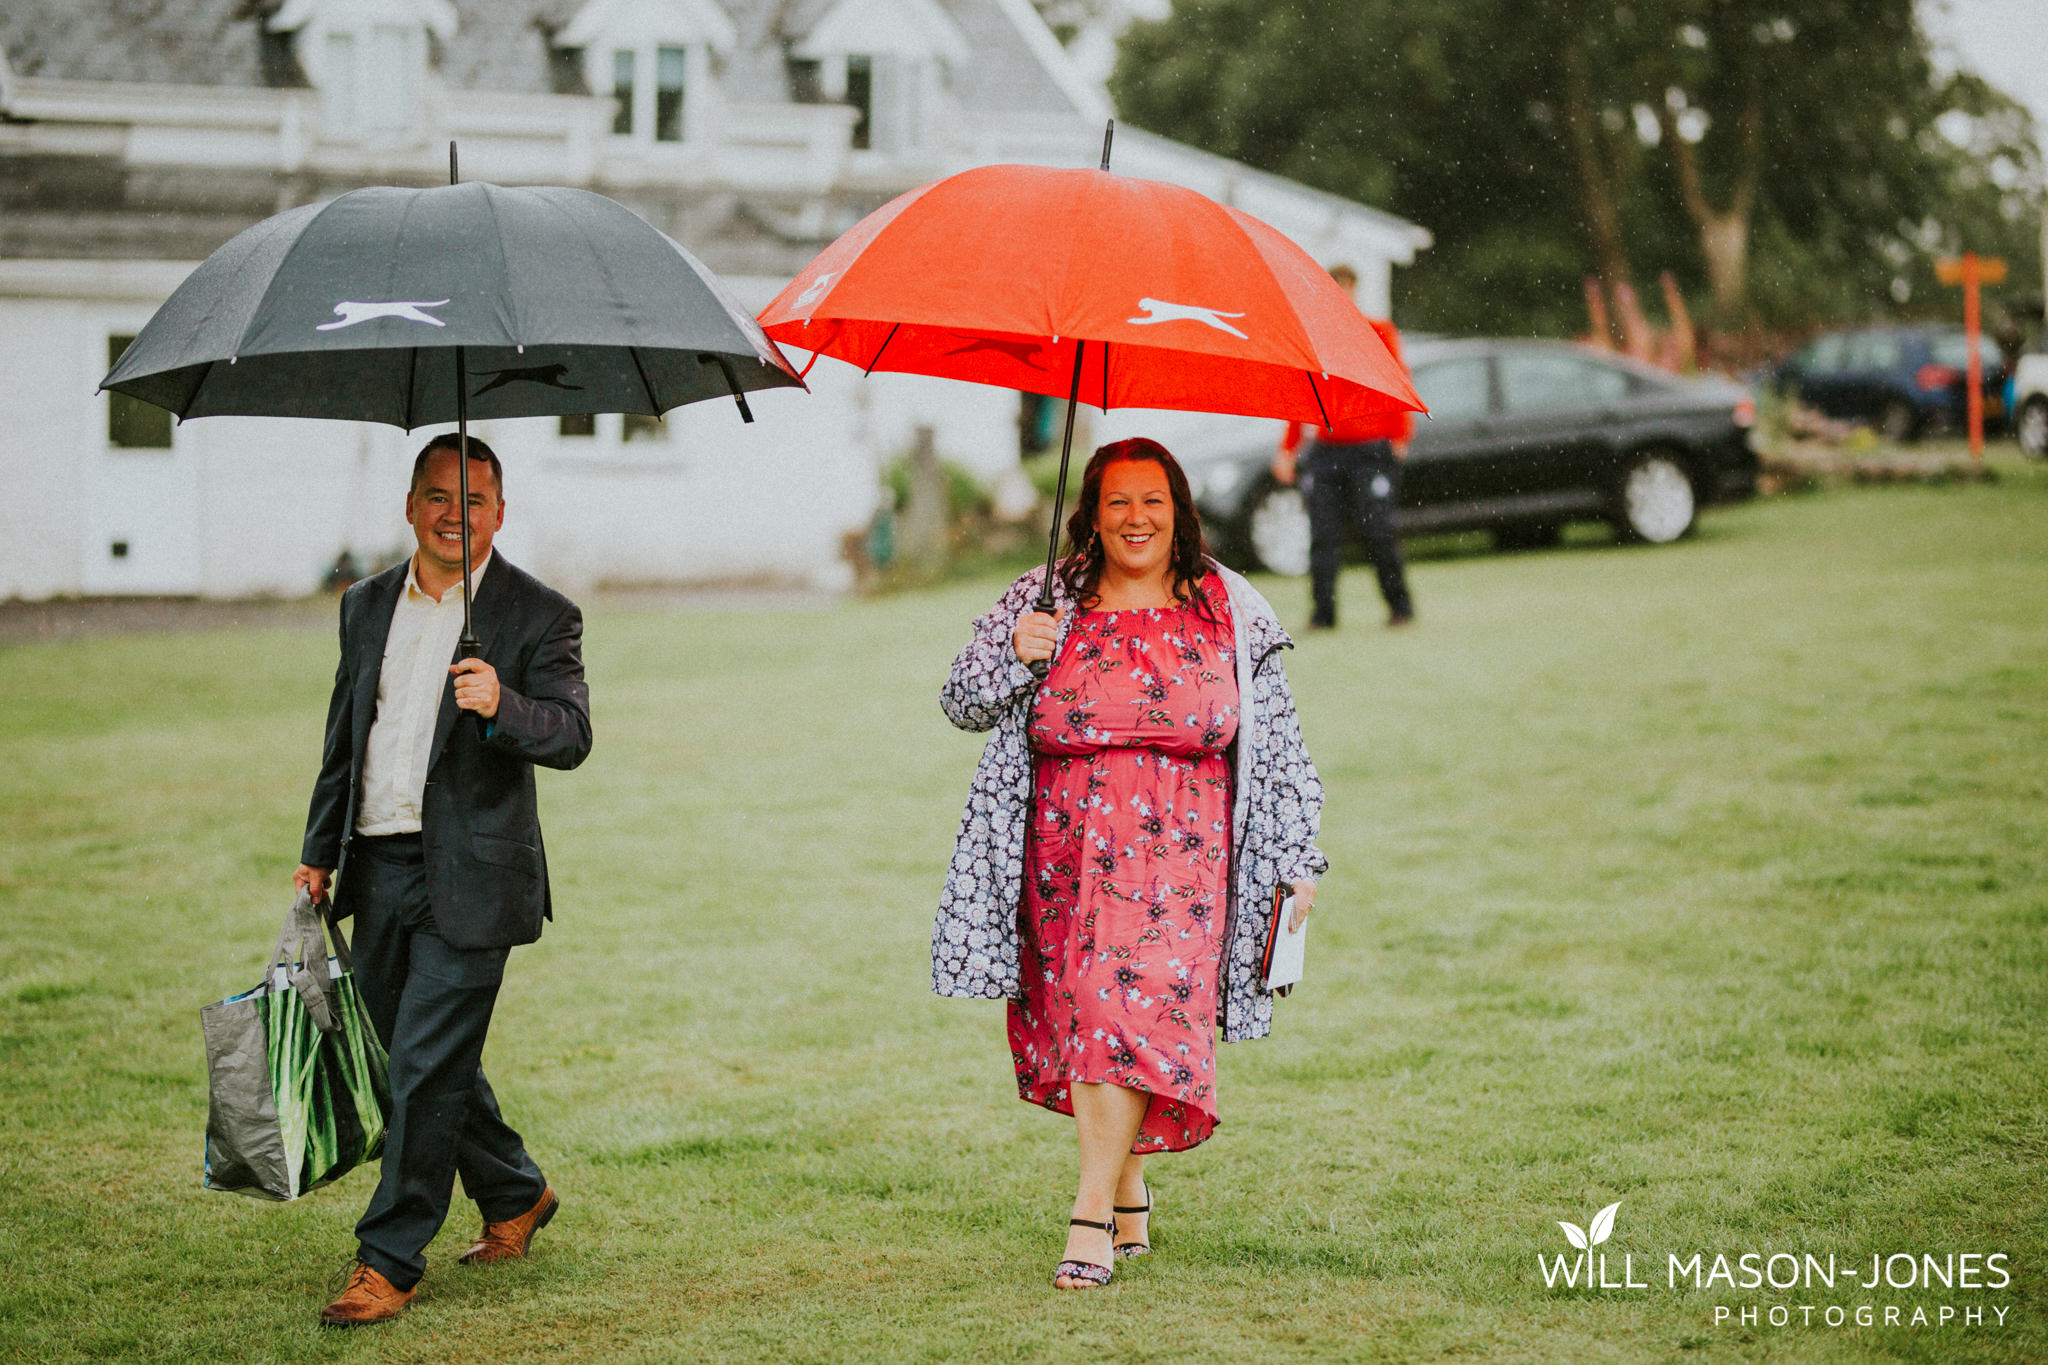 outdoor-wet-rainy-wedding-uk-swansea-photography-5.jpg